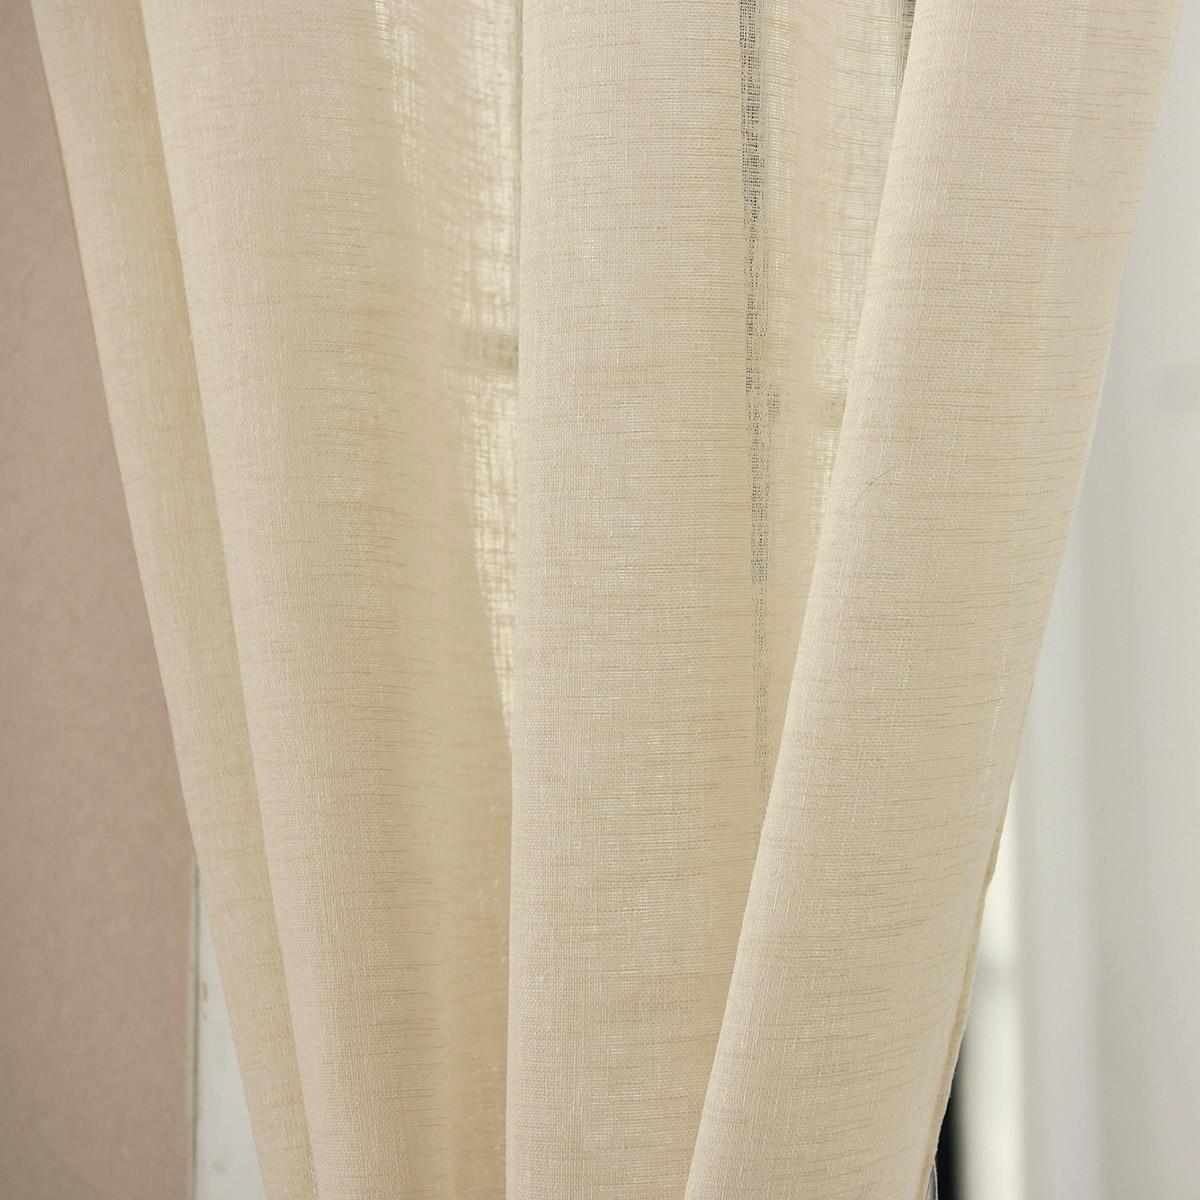 gardinen transparent leinen kr uselband stores vorhang schal 4 farben 630 a. Black Bedroom Furniture Sets. Home Design Ideas